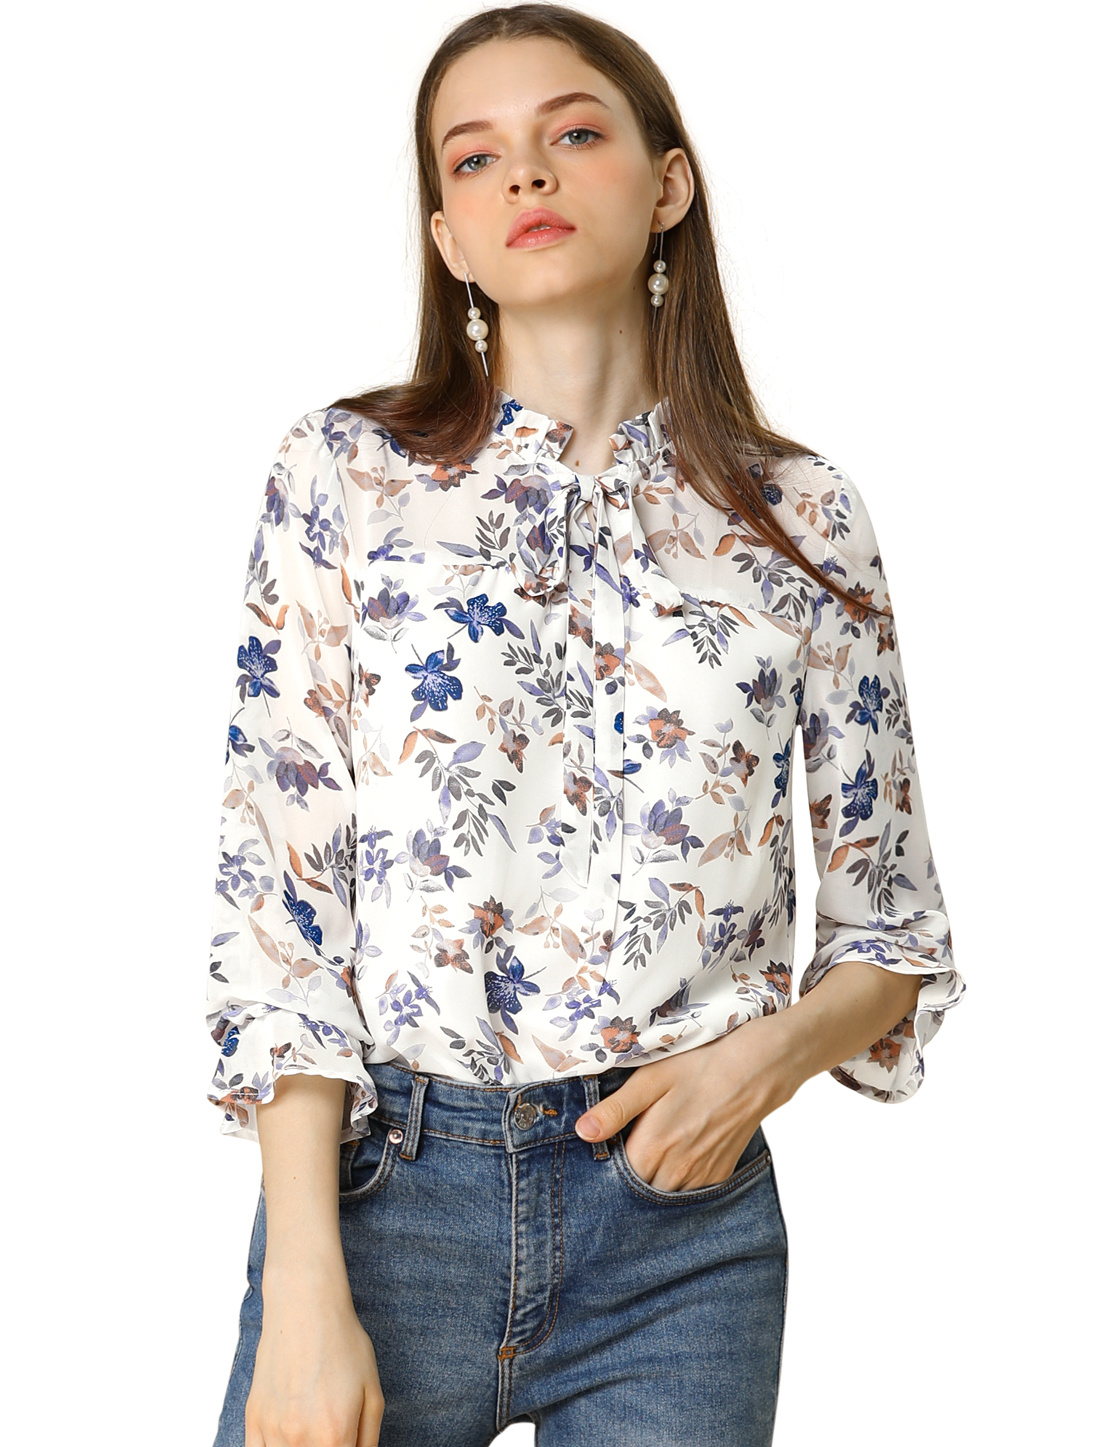 Allegra K Women's Long Sleeve Tie Neck Ruffle Collar Floral Print Top White XL